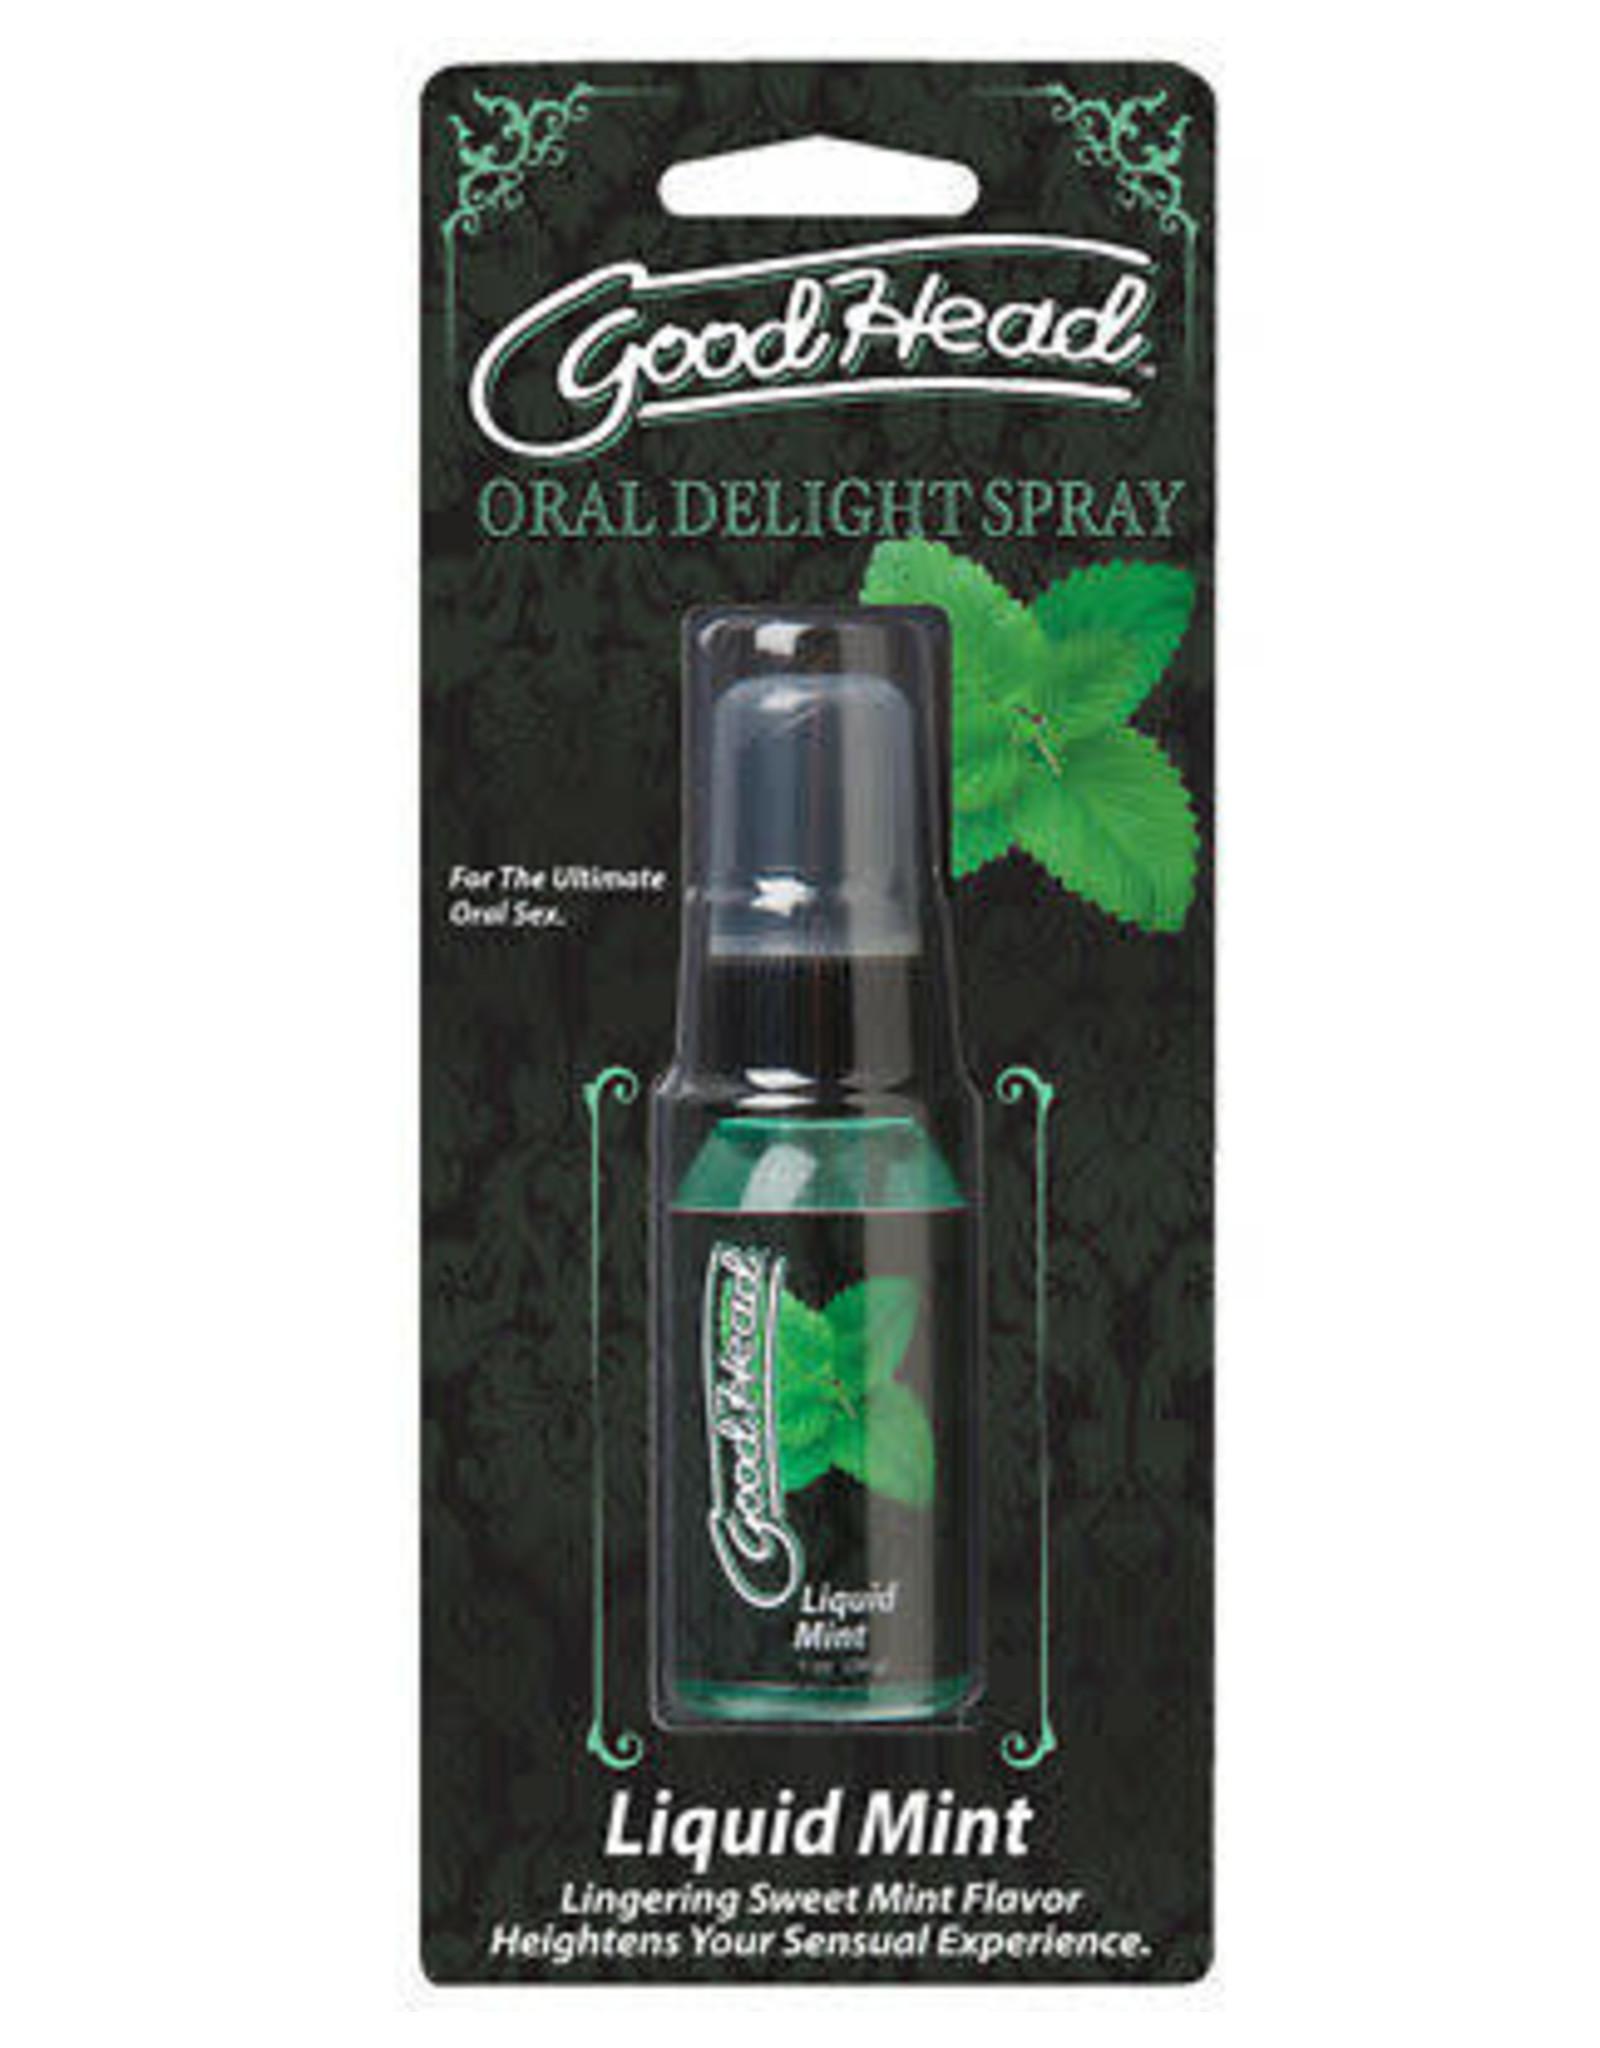 GOOD HEAD - ORAL DELIGHT SPRAY - MINT 1oz